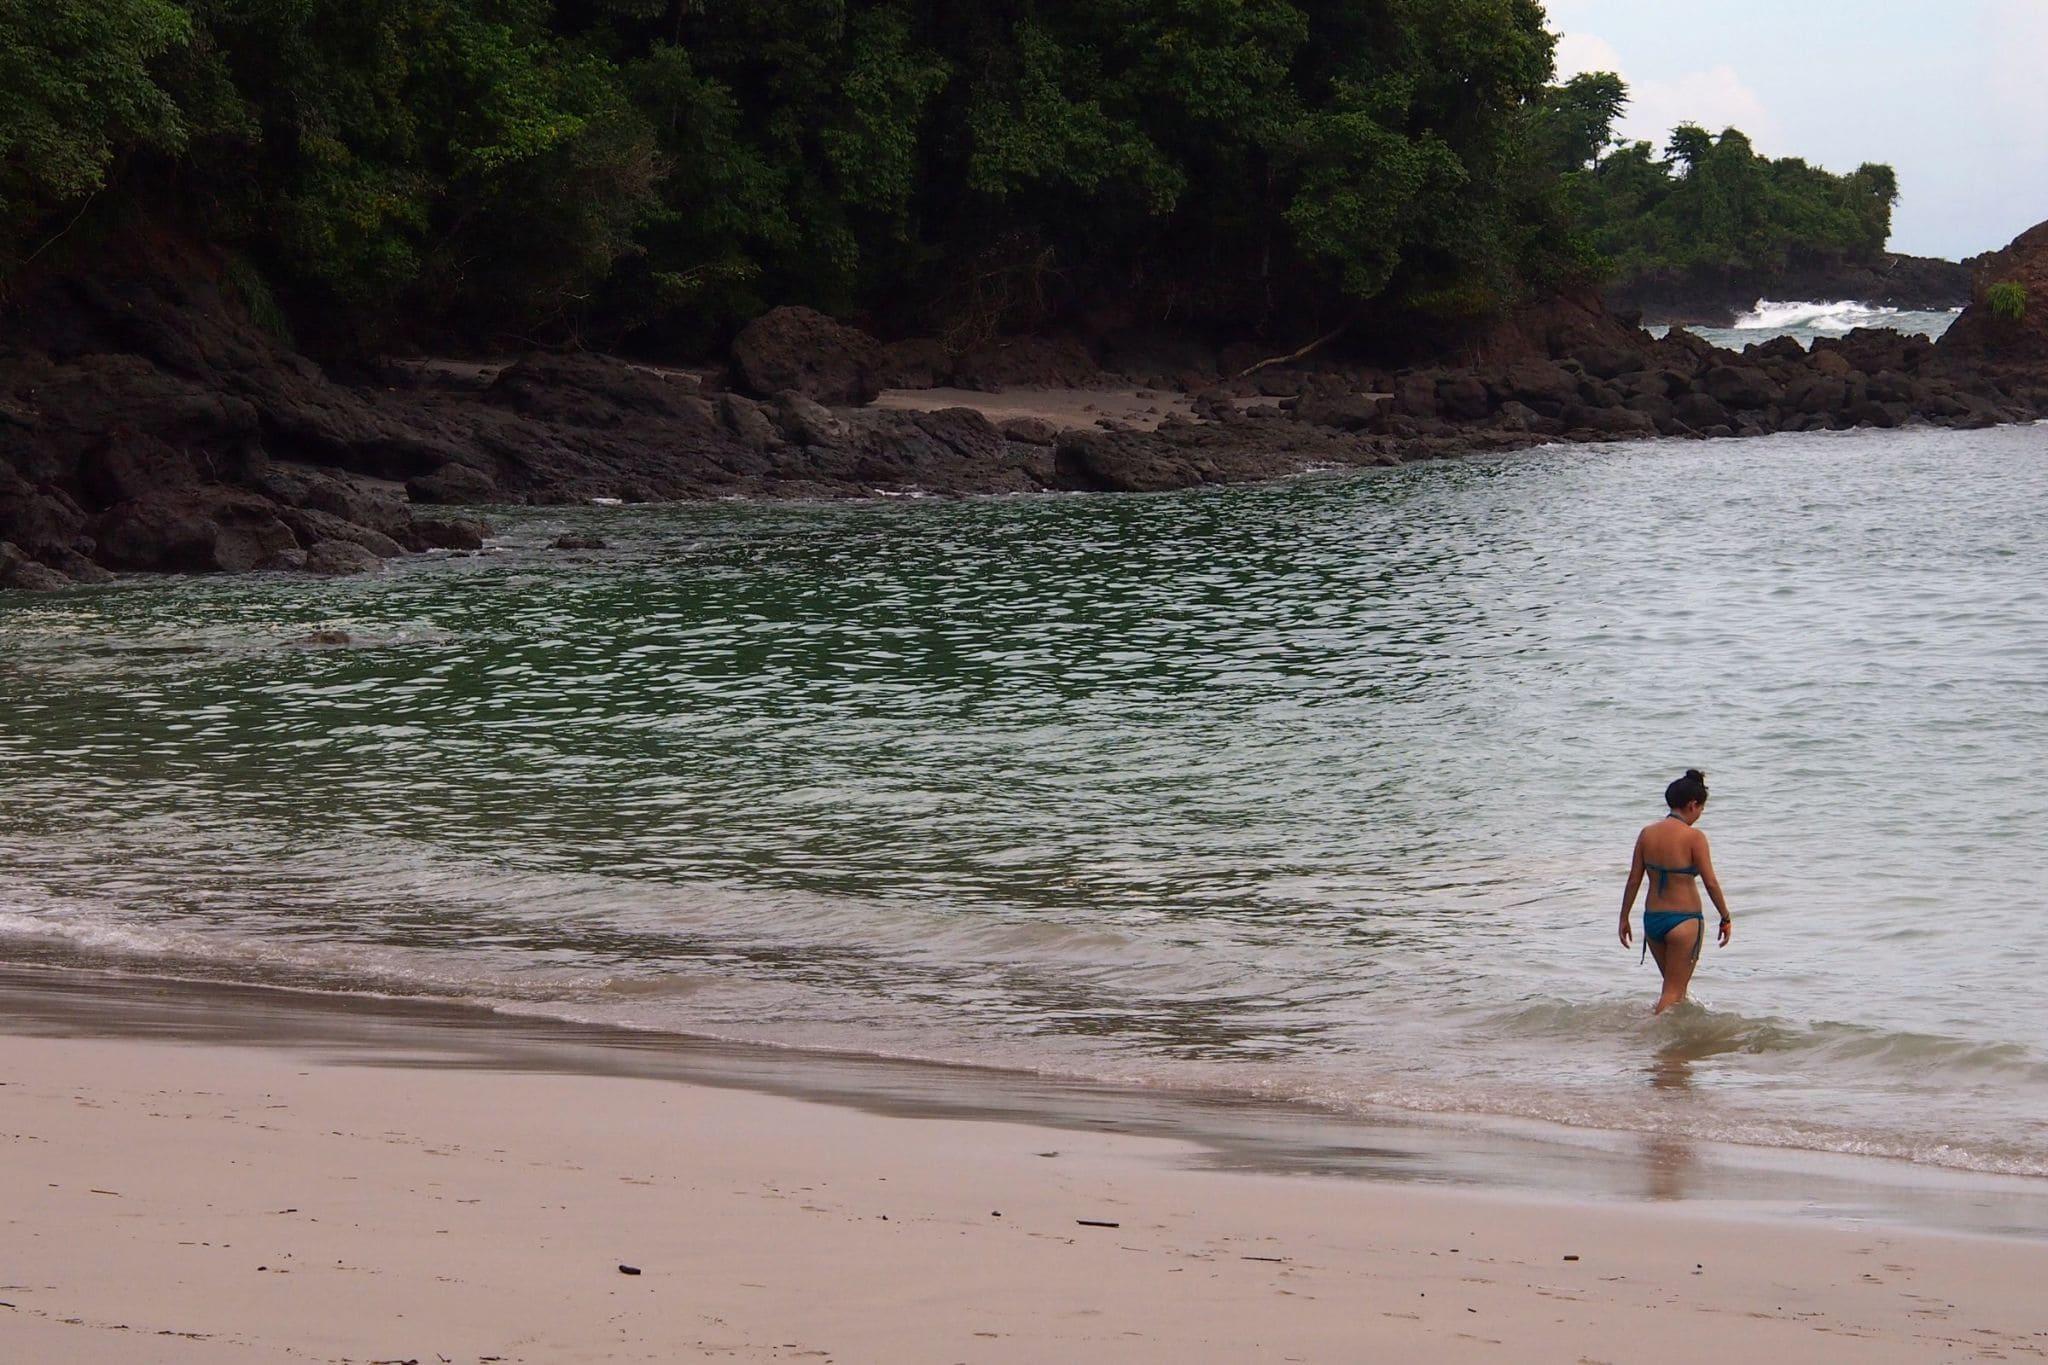 Private Playa Time at Manuel Antonio National Park, Costa Rica